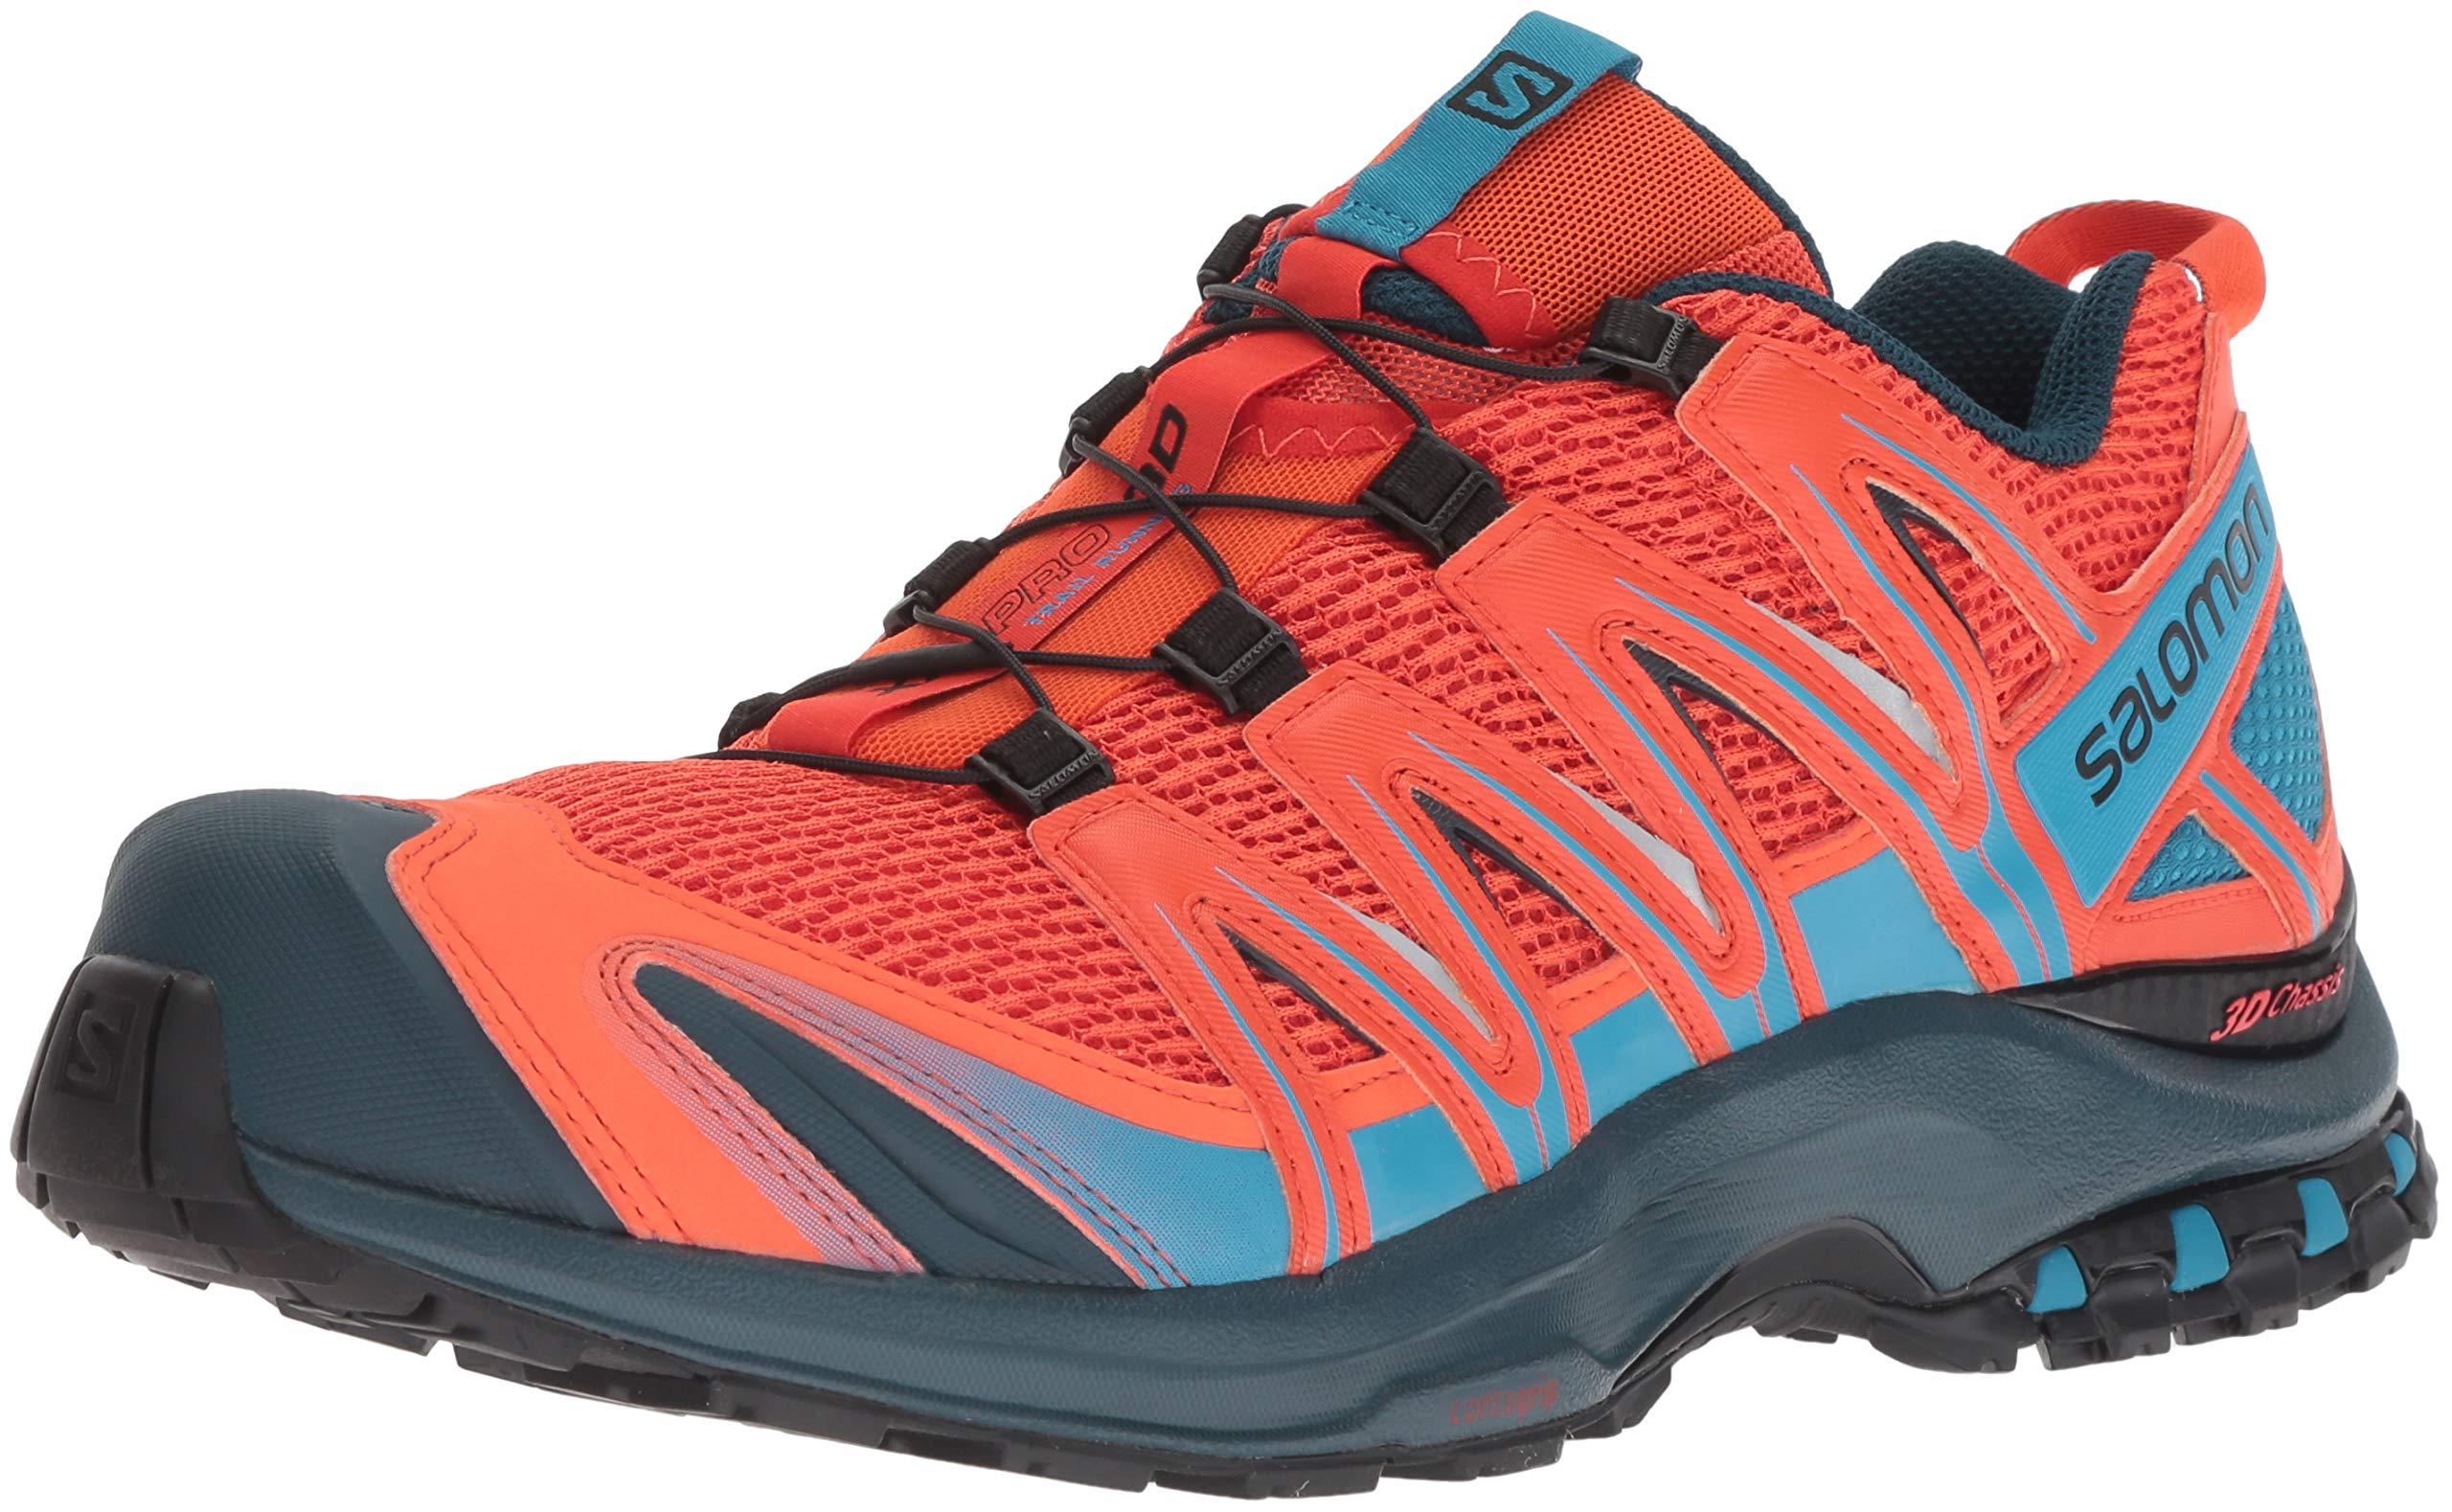 cd266bf5ed0c Galleon - Salomon Men s Xa Pro 3D Trail Running Shoe